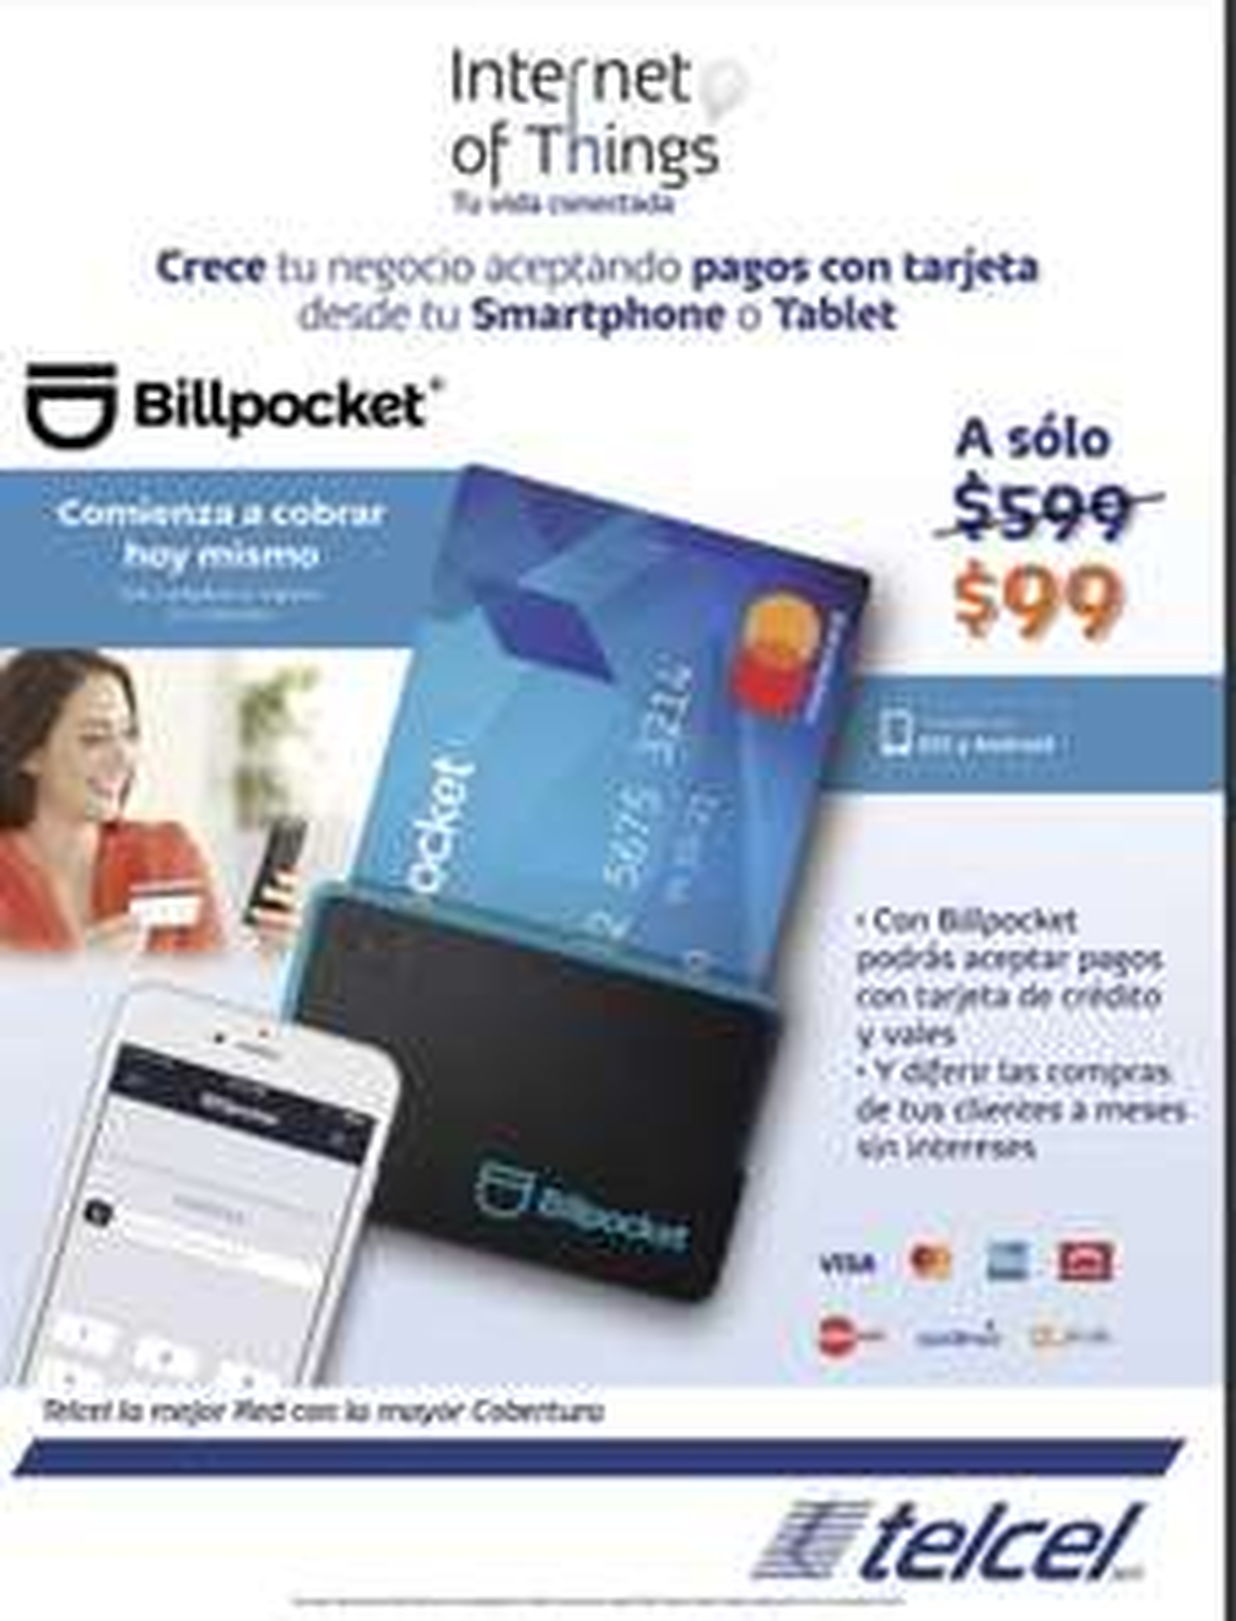 Telcel: Billpocket Lector de tarjetas TC y débito $99